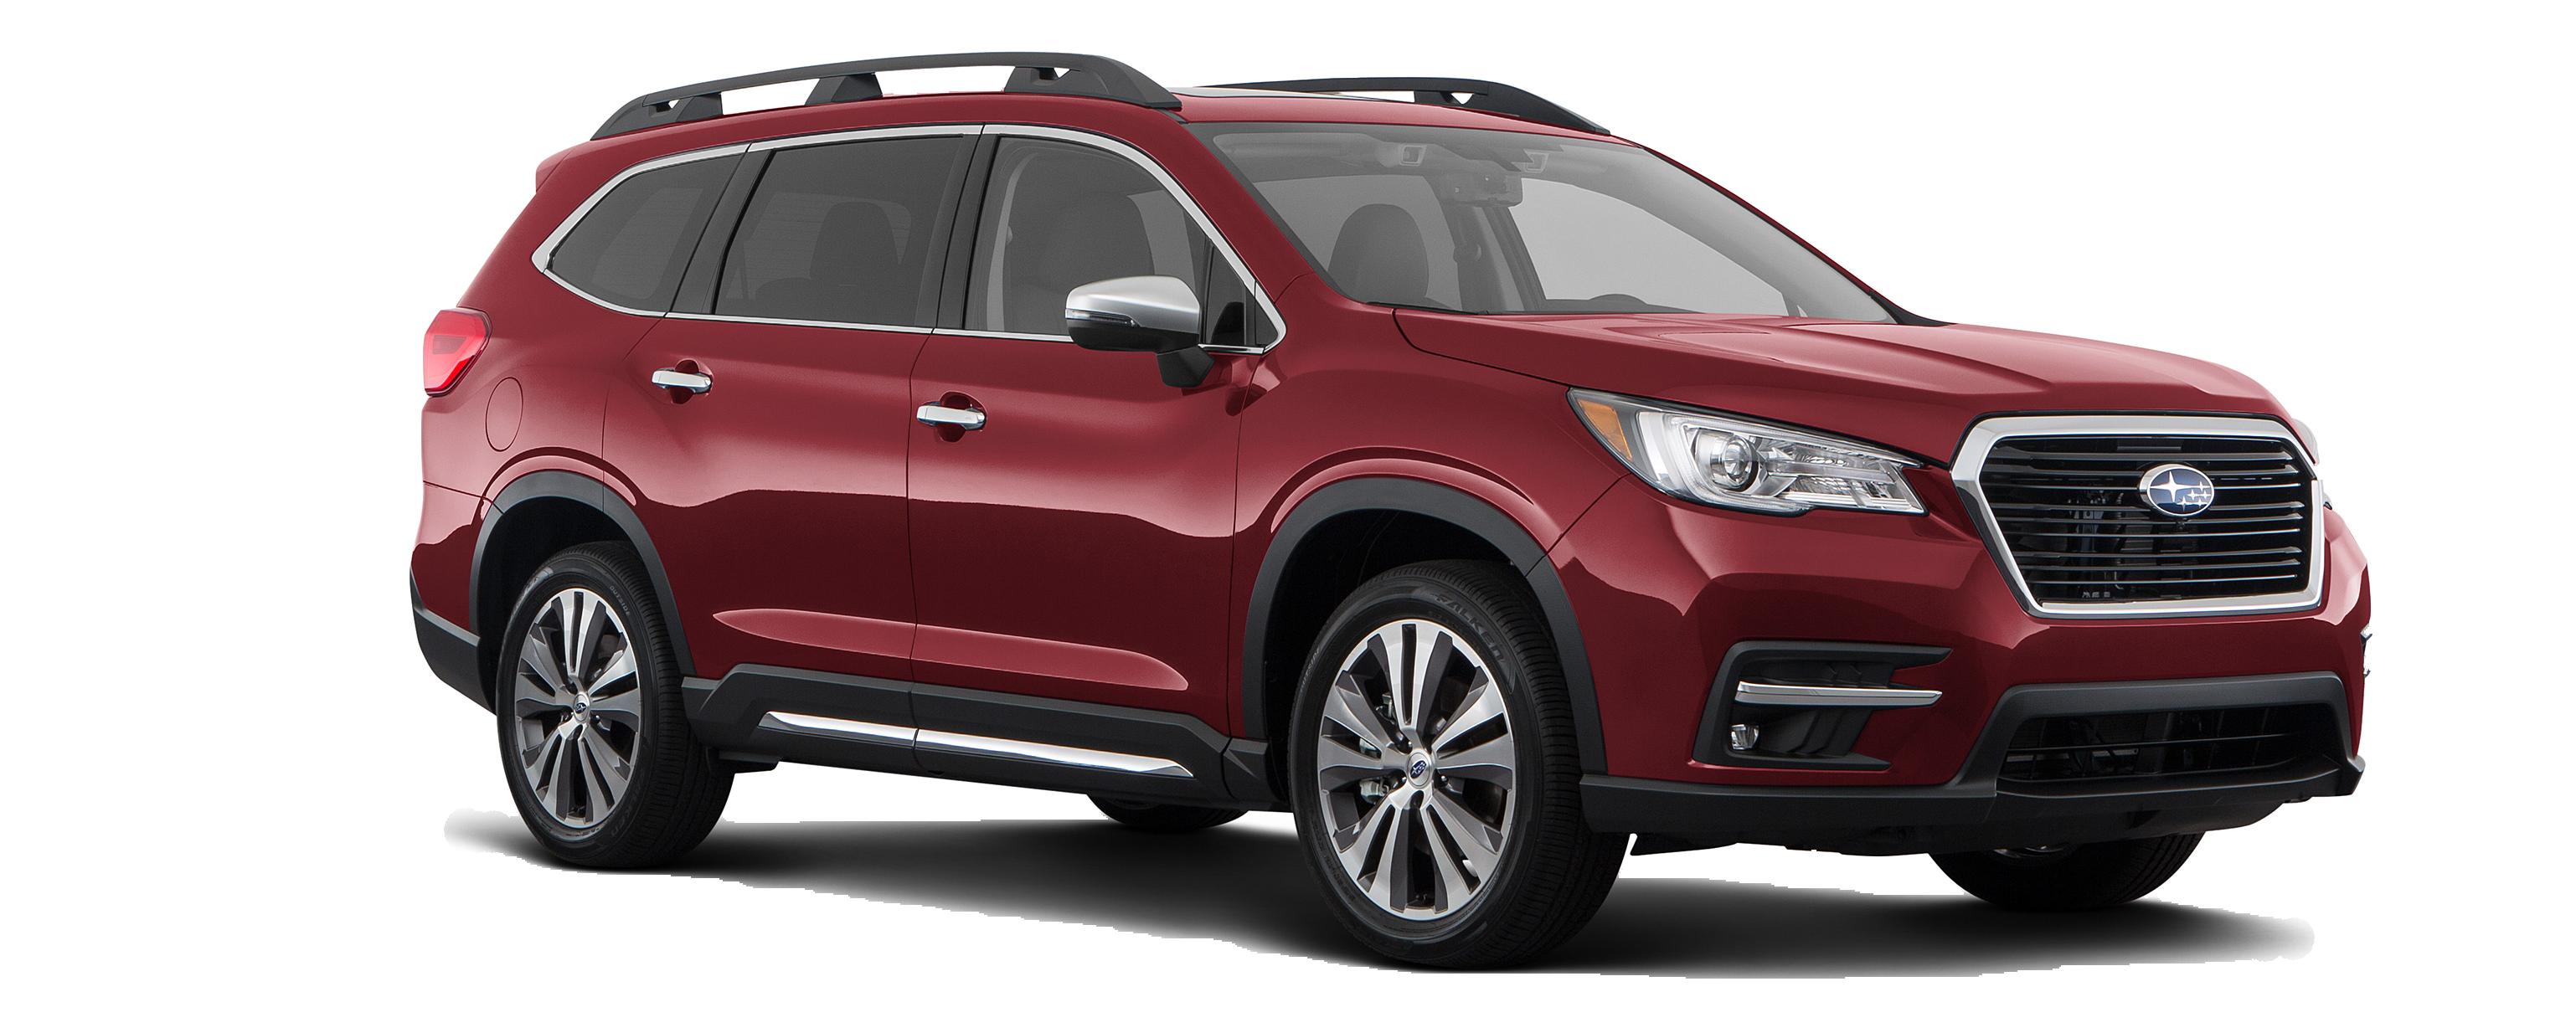 Walnut Creek Subaru >> 2019 Subaru Ascent Model Overview | Livermore, CA | Livermore Subaru